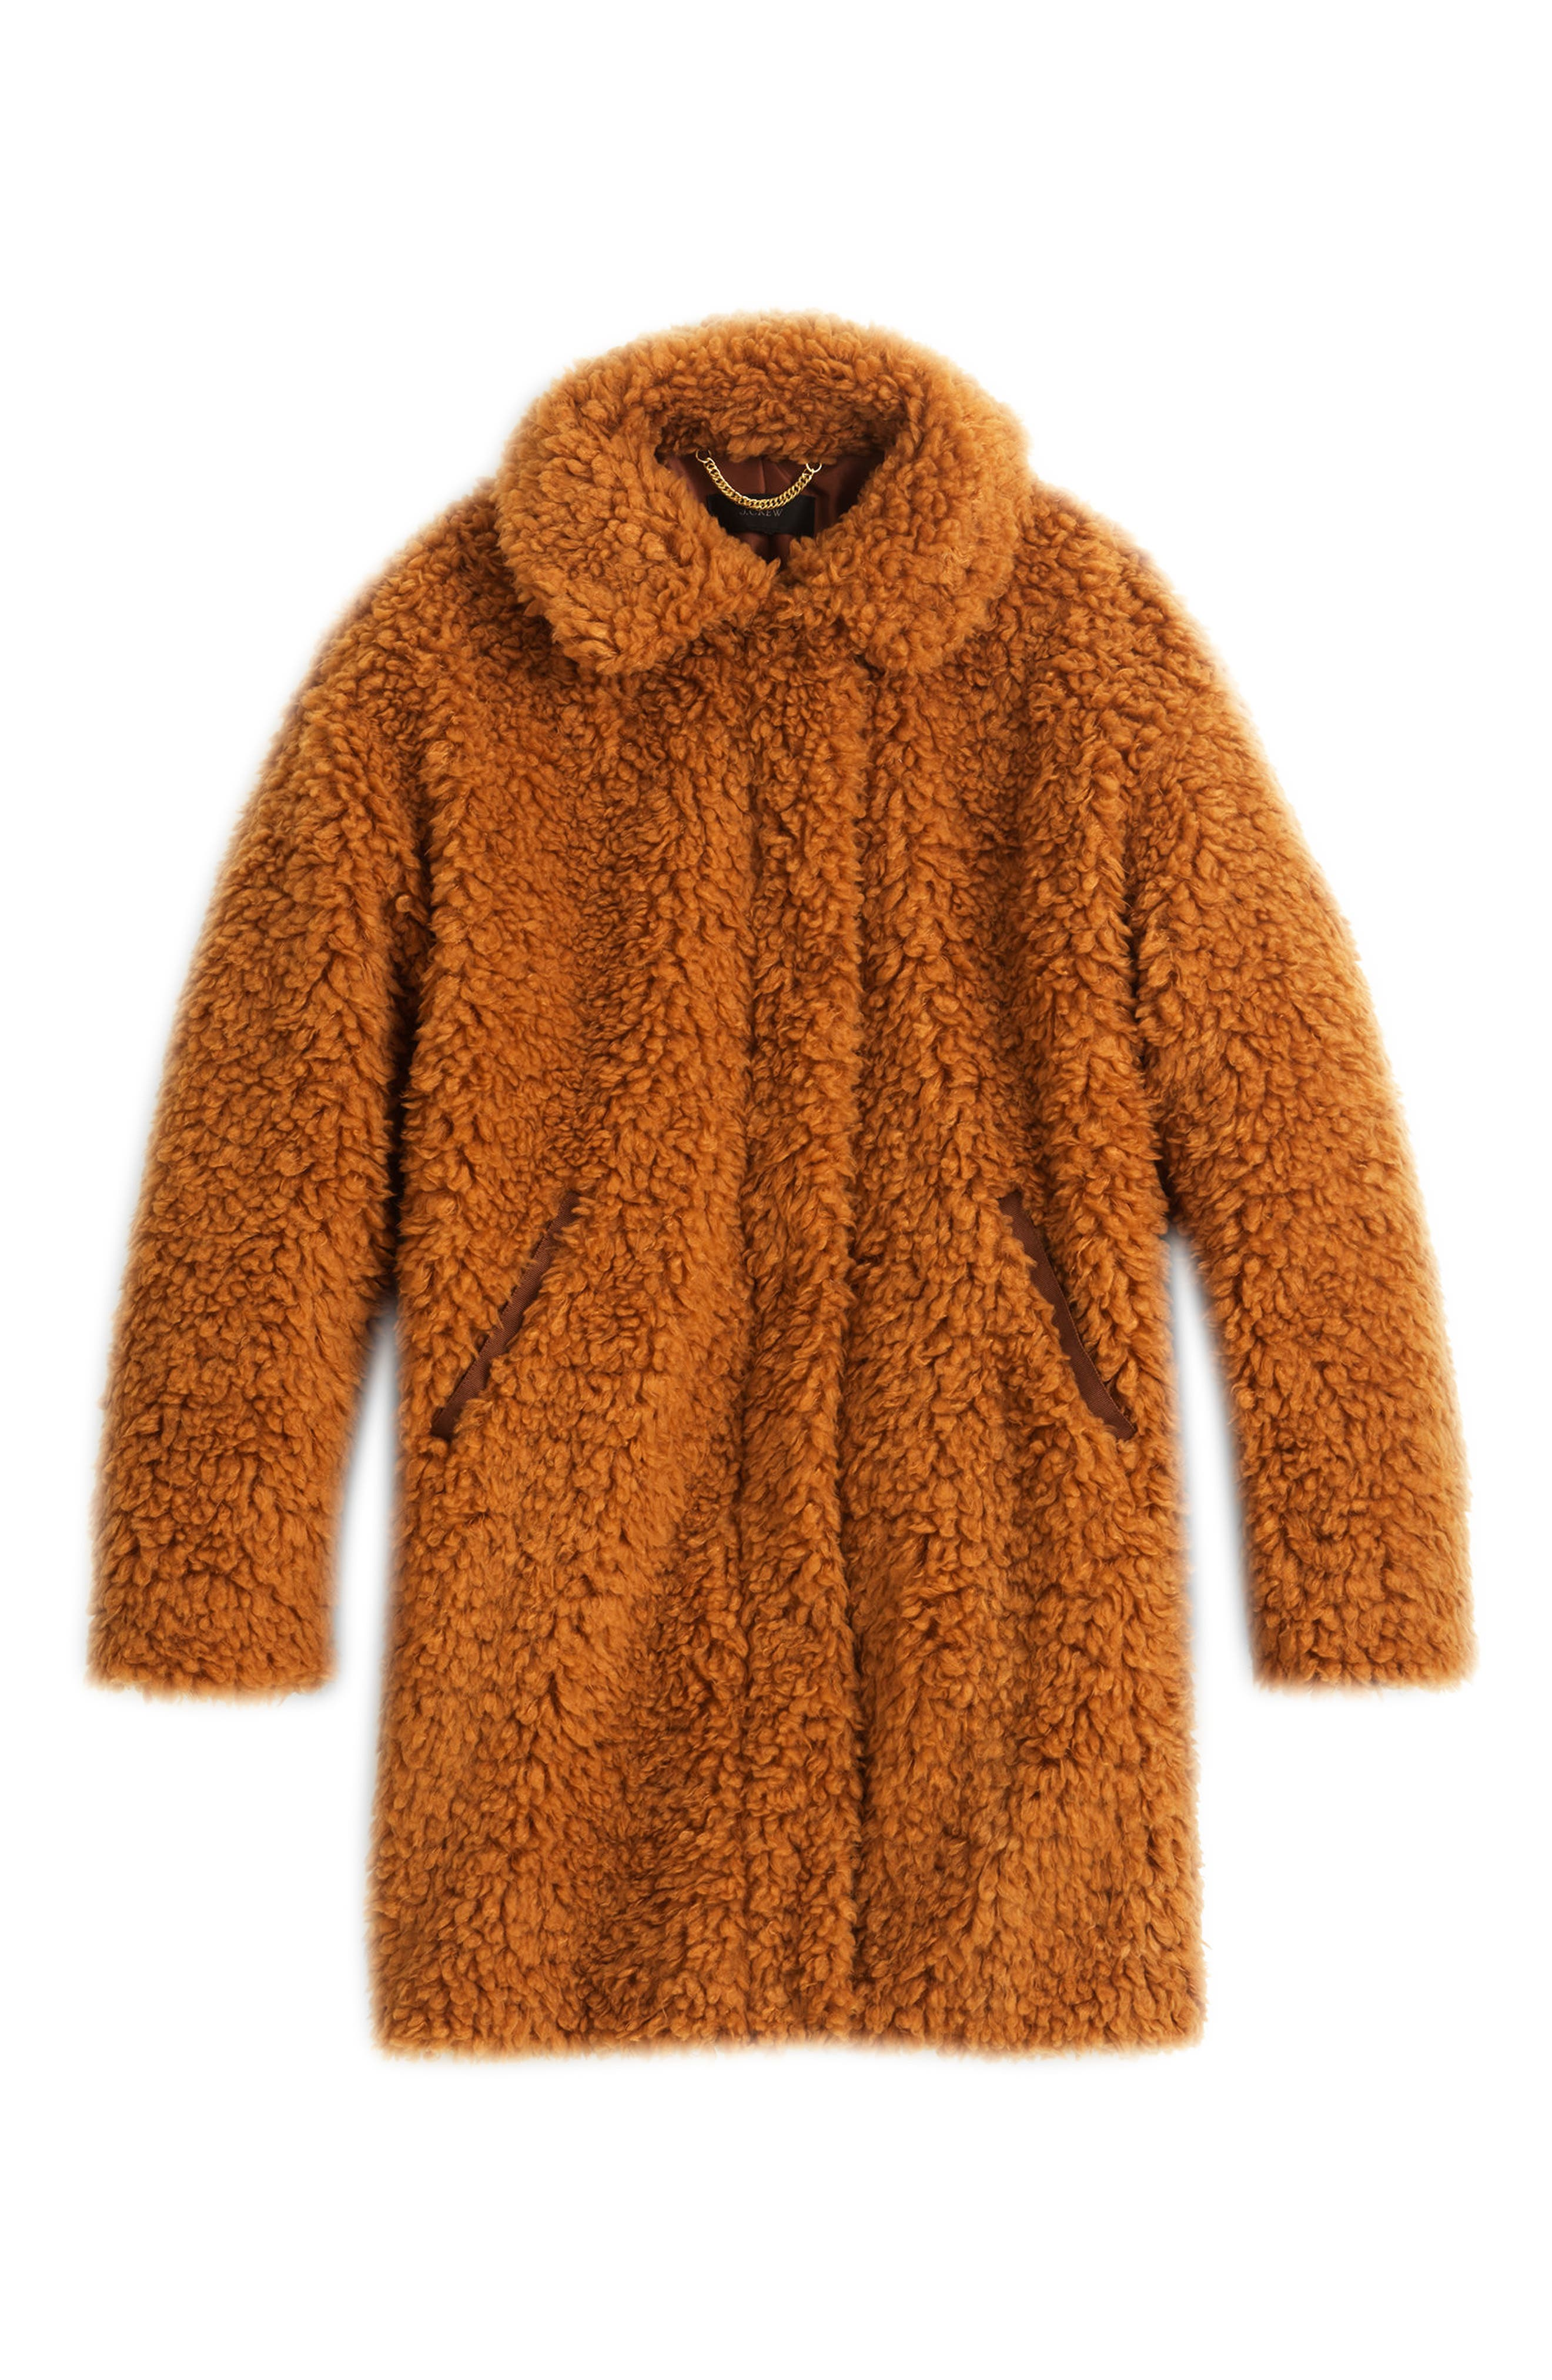 J.CREW, Teddy Faux Fur Coat, Main thumbnail 1, color, 200